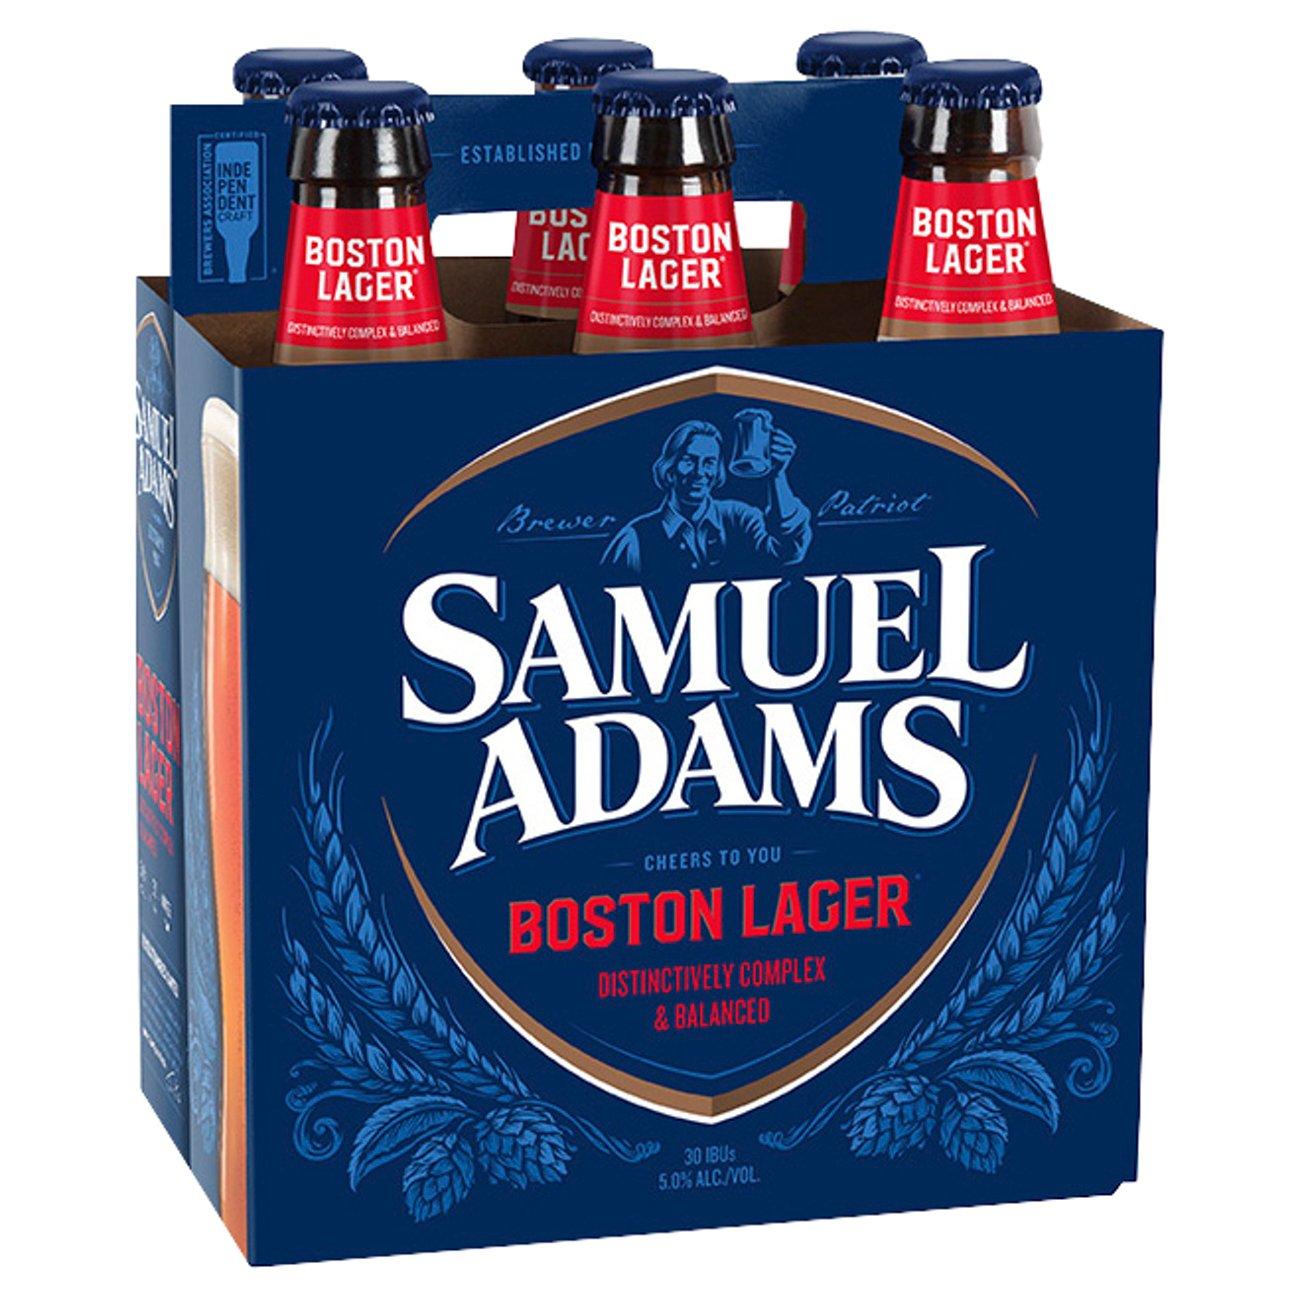 Samuel Adams Boston Lager Beer 12 oz Bottles - Shop Beer at H-E-B